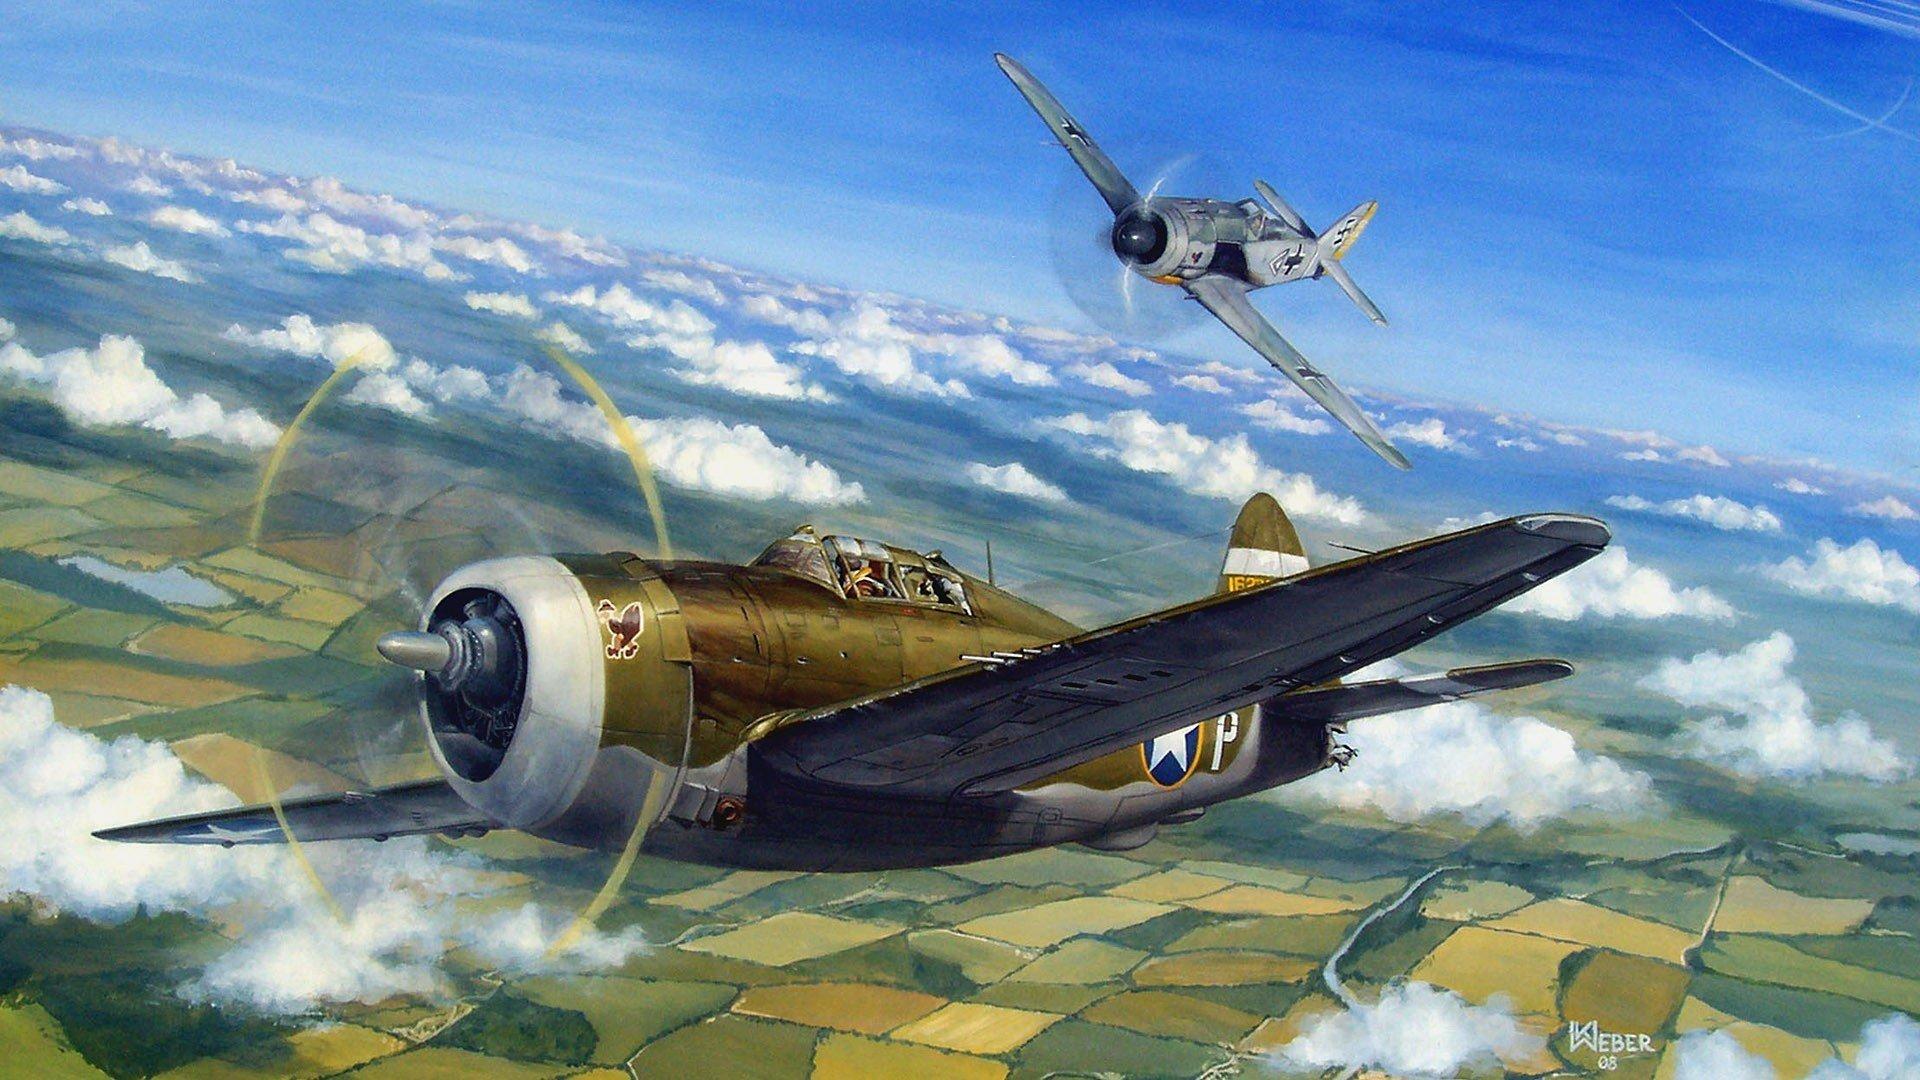 1920x1080 P 47 Thunderbolt Air Combat Dogfight Ww2 War Painting Drawing Art